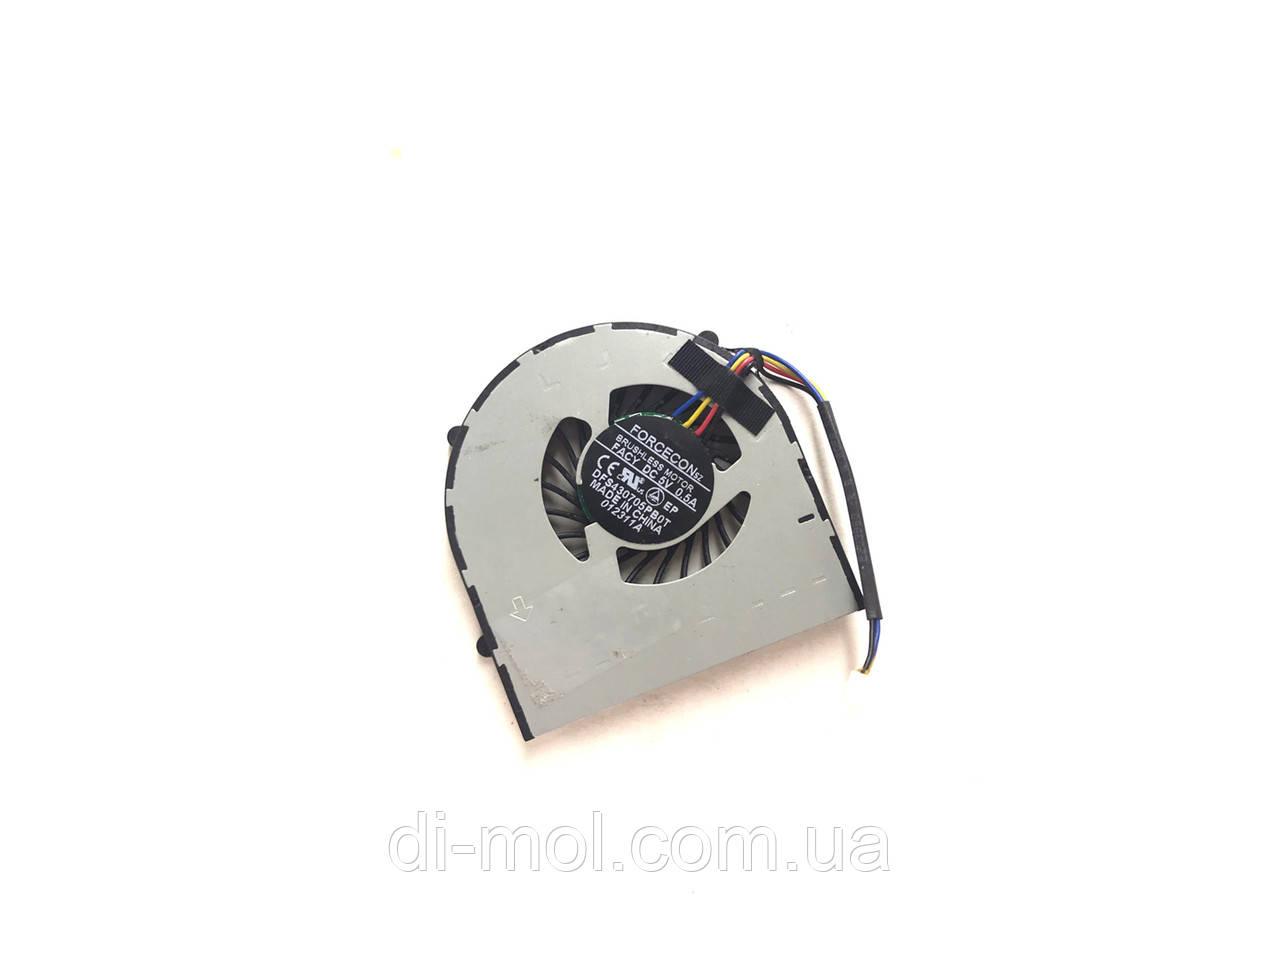 Вентилятор для ноутбука Lenovo IdeaPad S205, U160, U165 series, 4-pin, версия 1